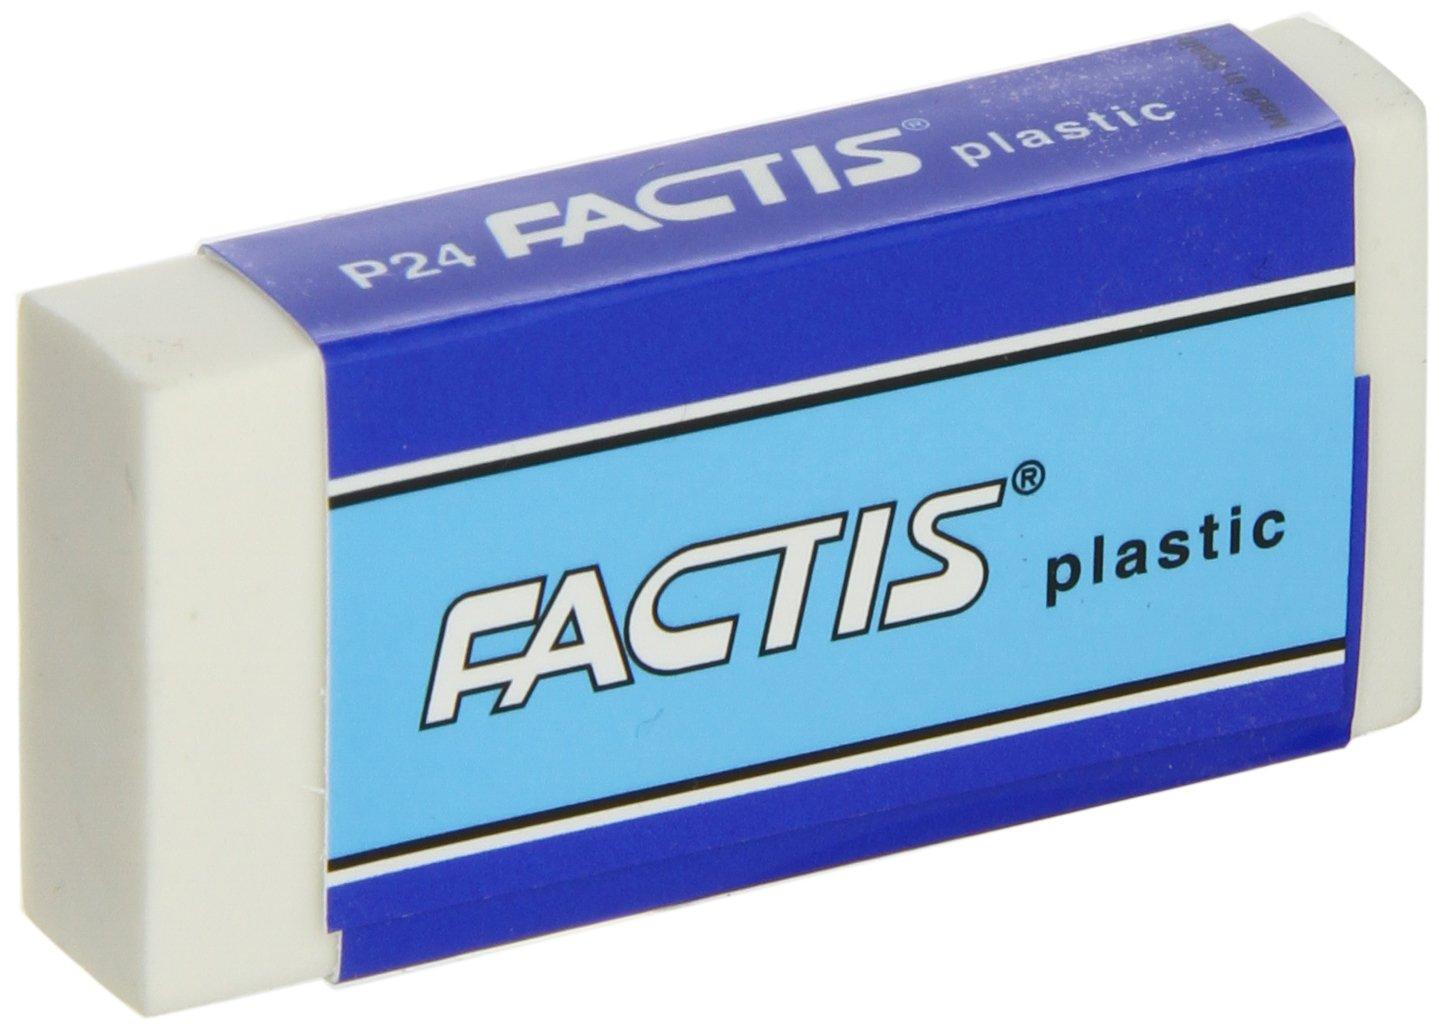 Factis Graphite Plastic Vinyl Eraser - Box of 24 - White by Factis (Image #1)